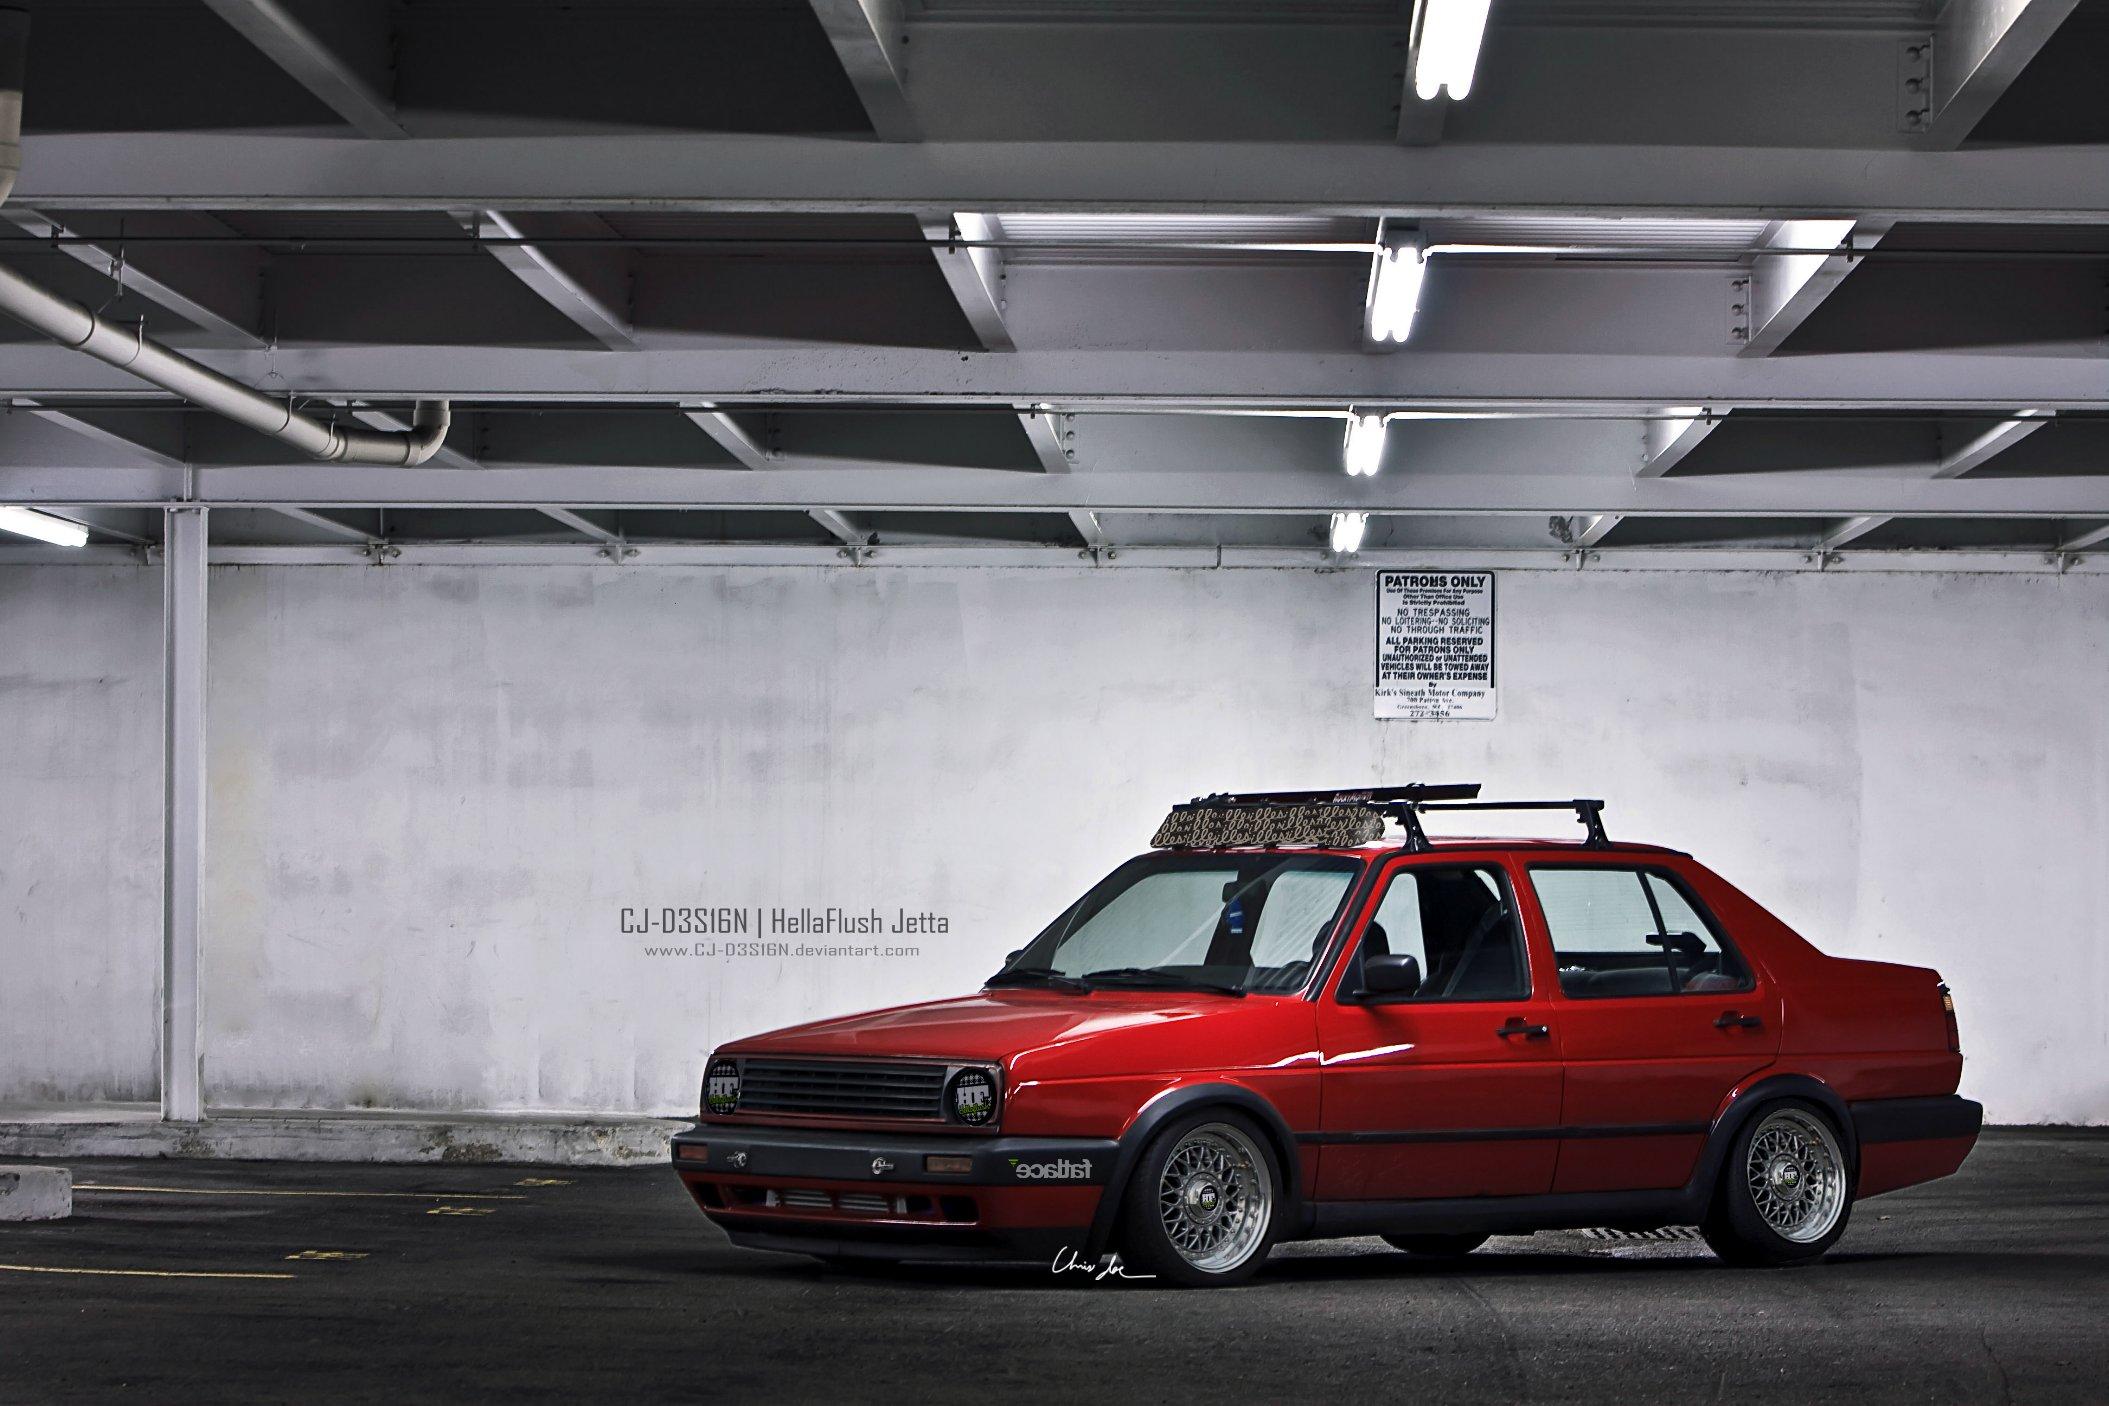 HellaFlush VW Jetta MK2 by